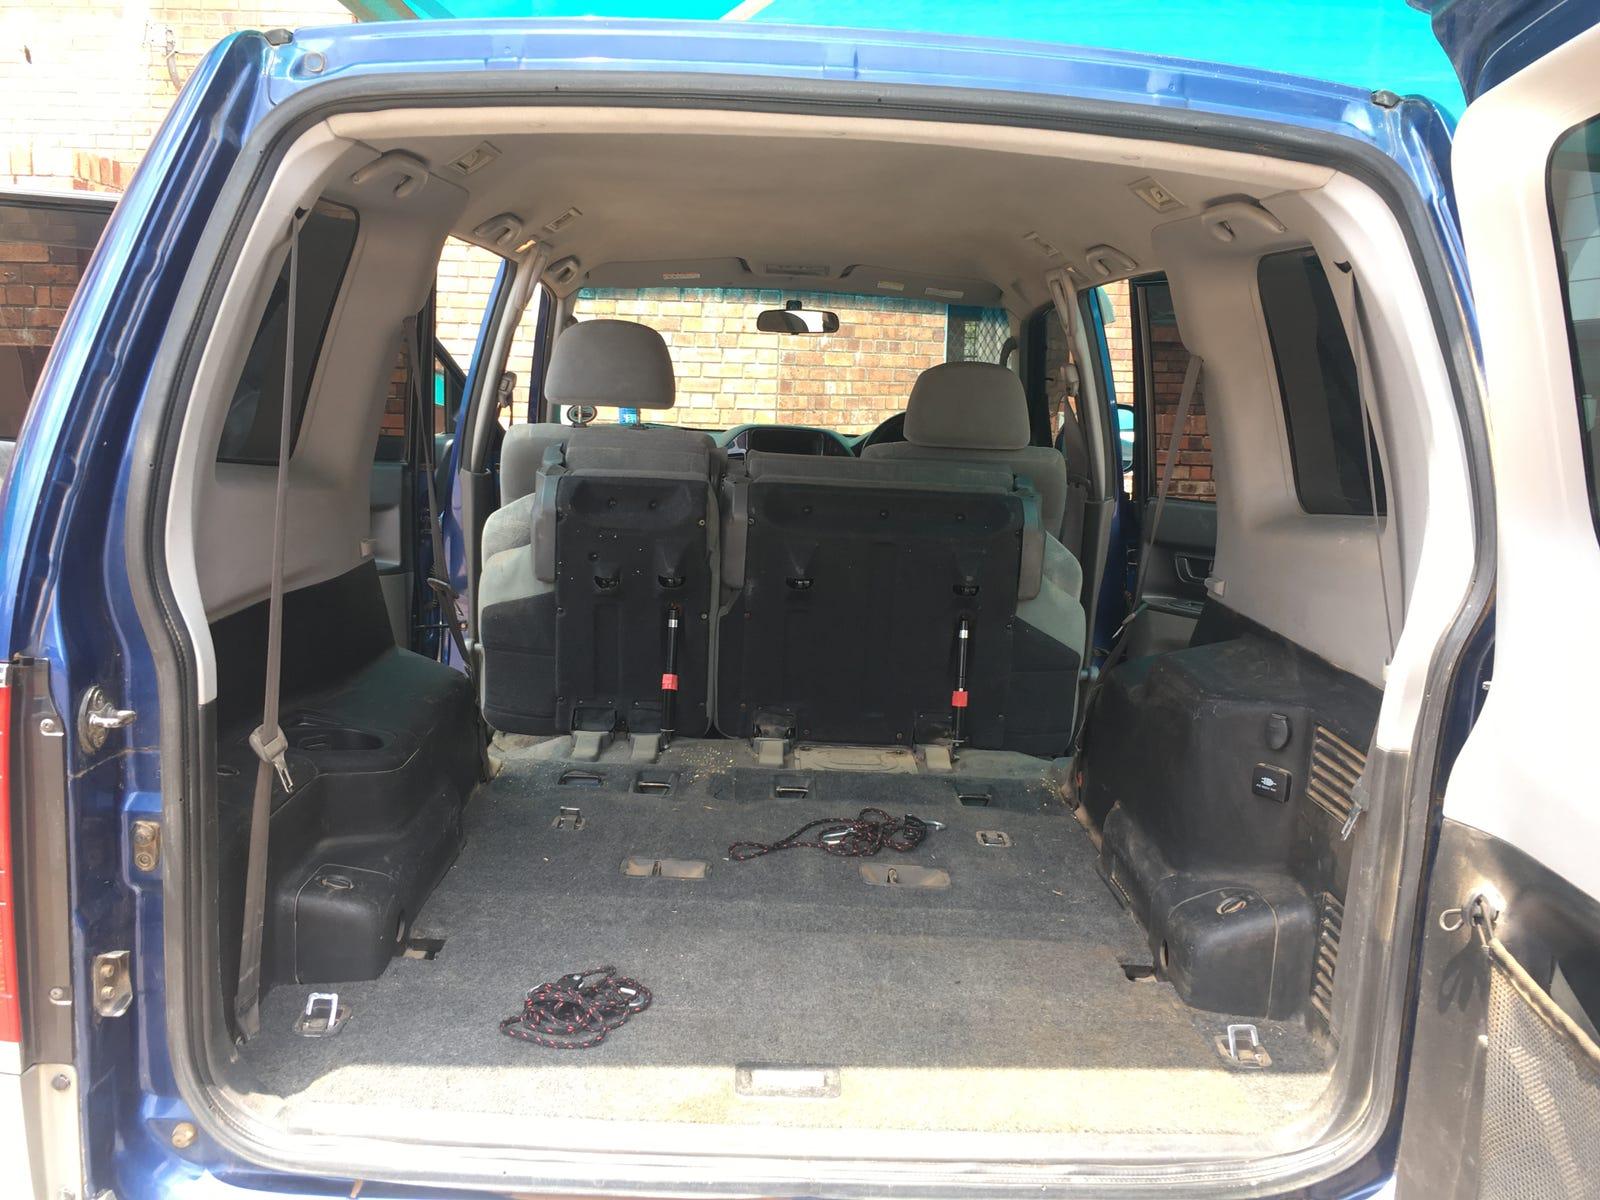 Seat rearranging: Option 1